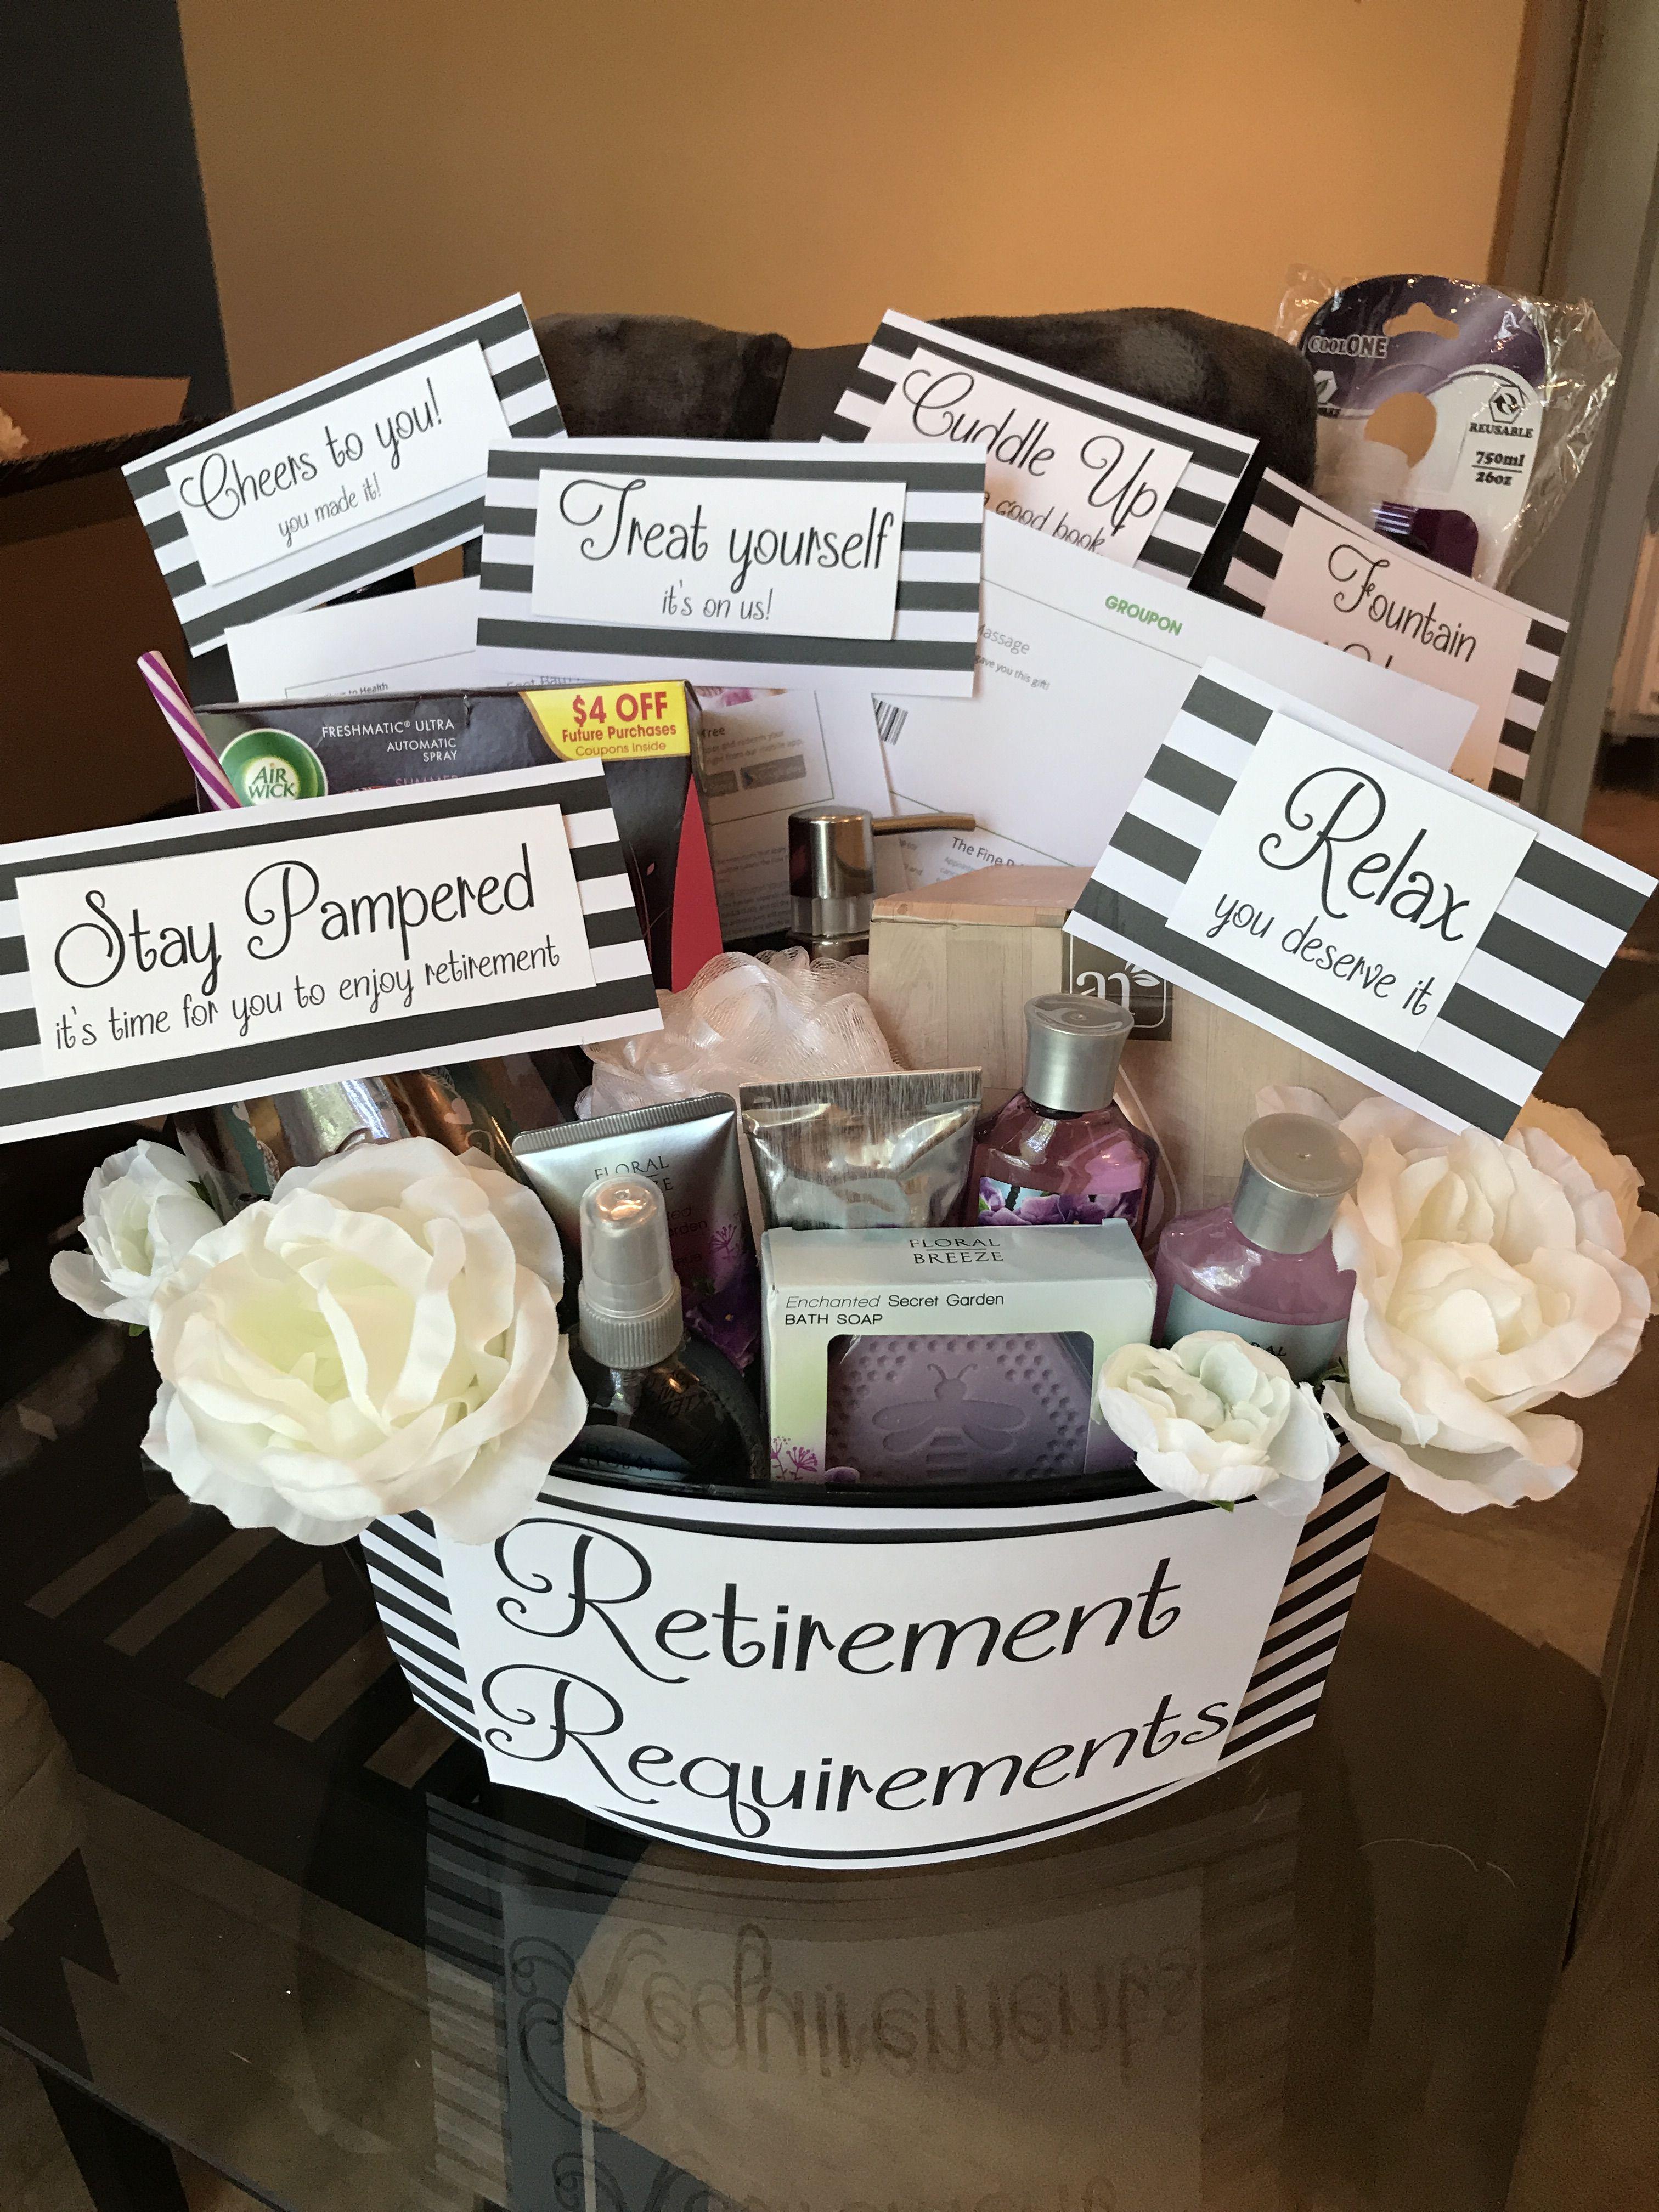 retirement requirements basket